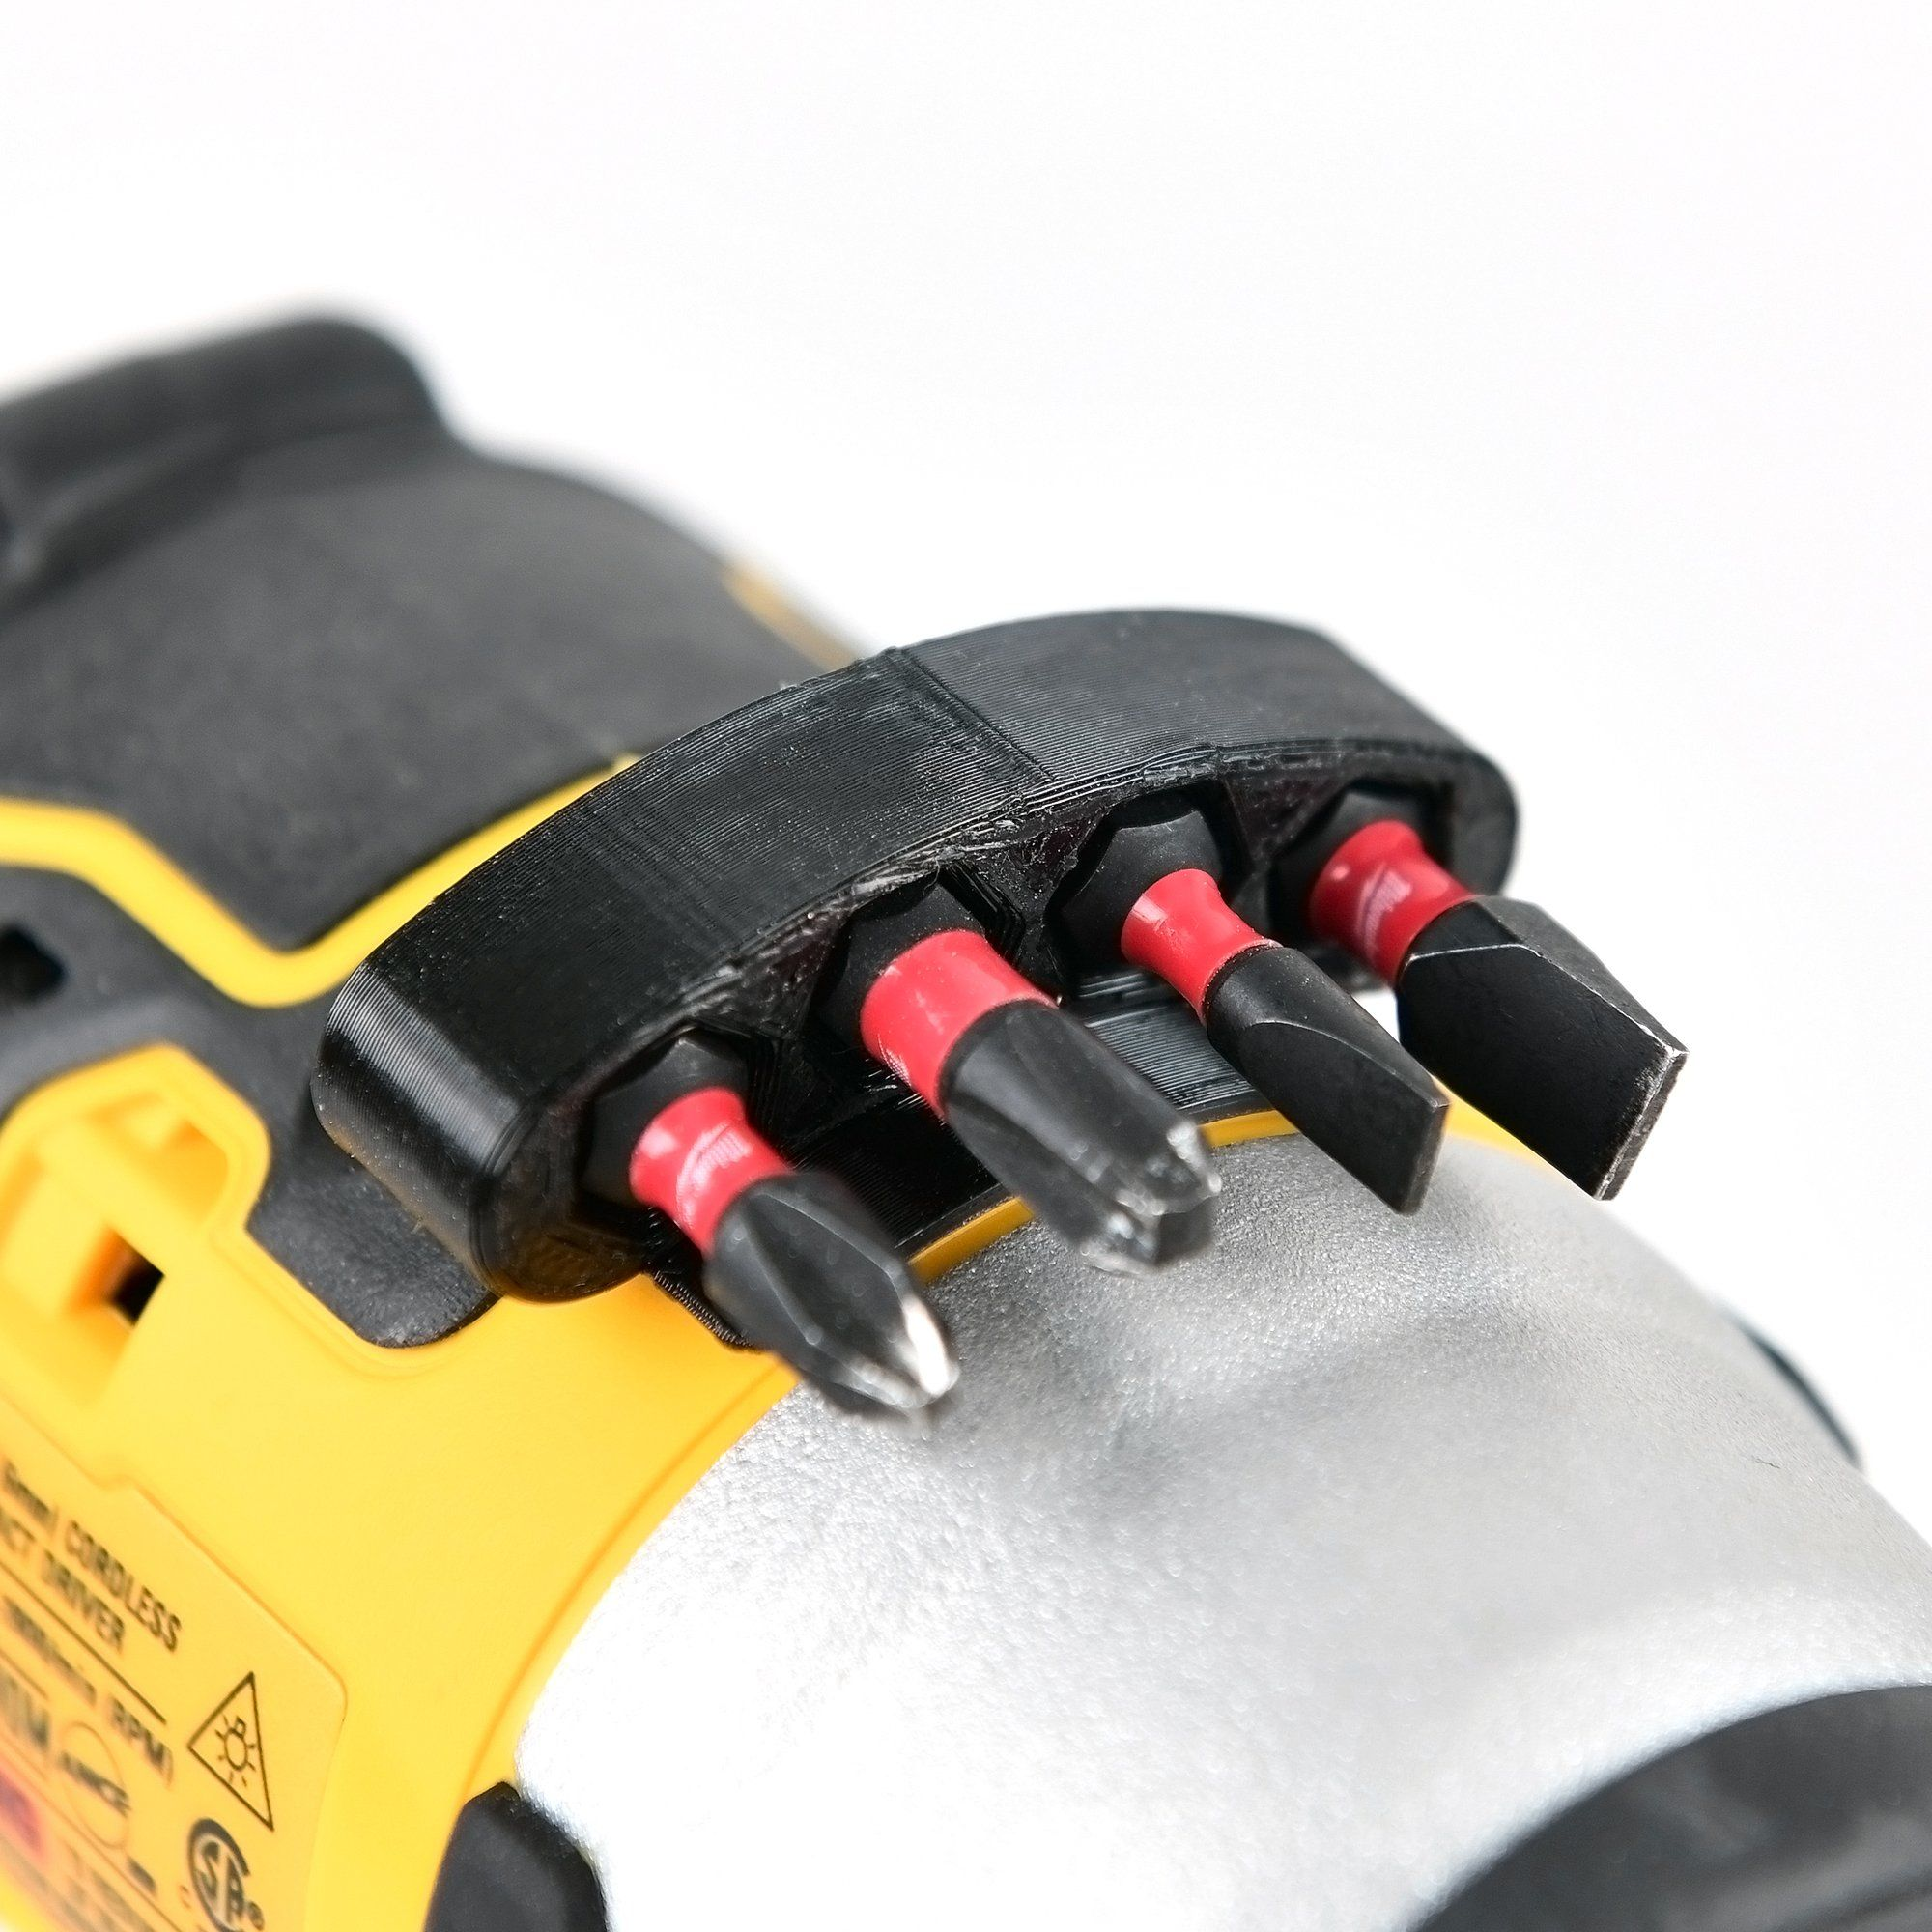 Photo of Drill Bits Mount Holder For DeWalt Milwaukee Makita Cordless Power Drill/Driver – Dewalt Yellow